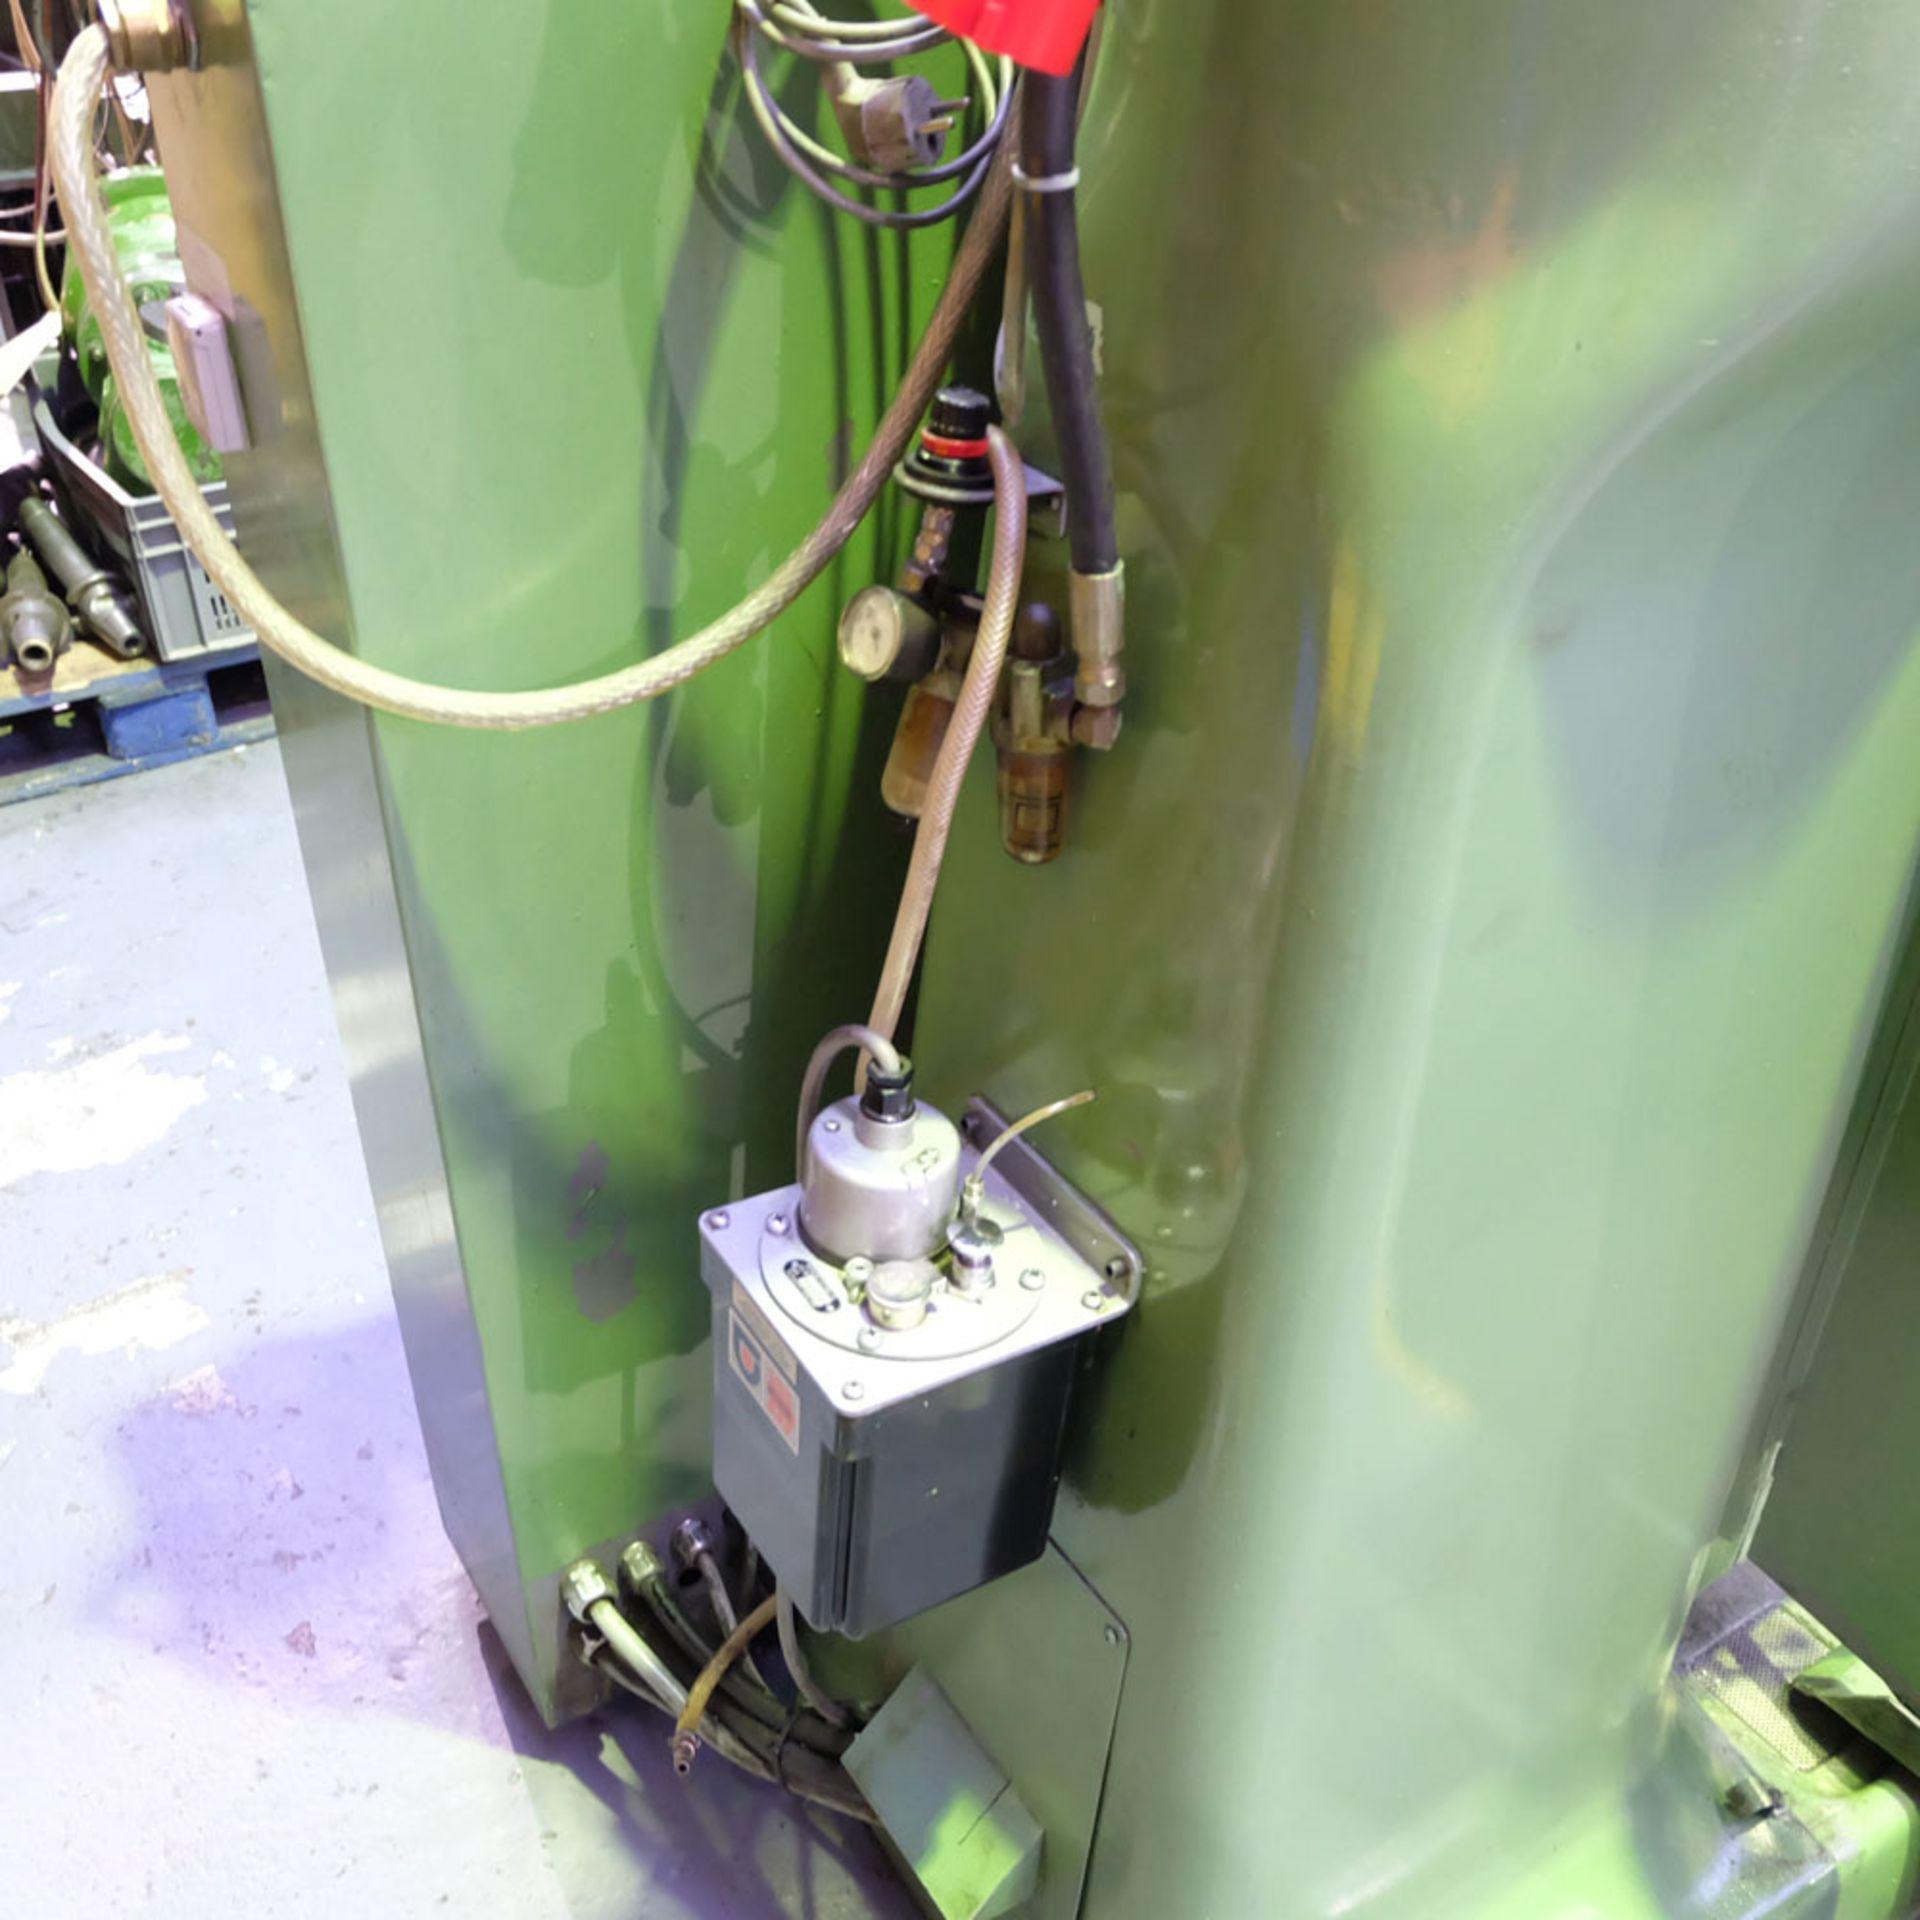 Bridgeport Series 1 MDI. CNC Mill with Heidenhain TNC131 3 Axis Control. - Image 14 of 14